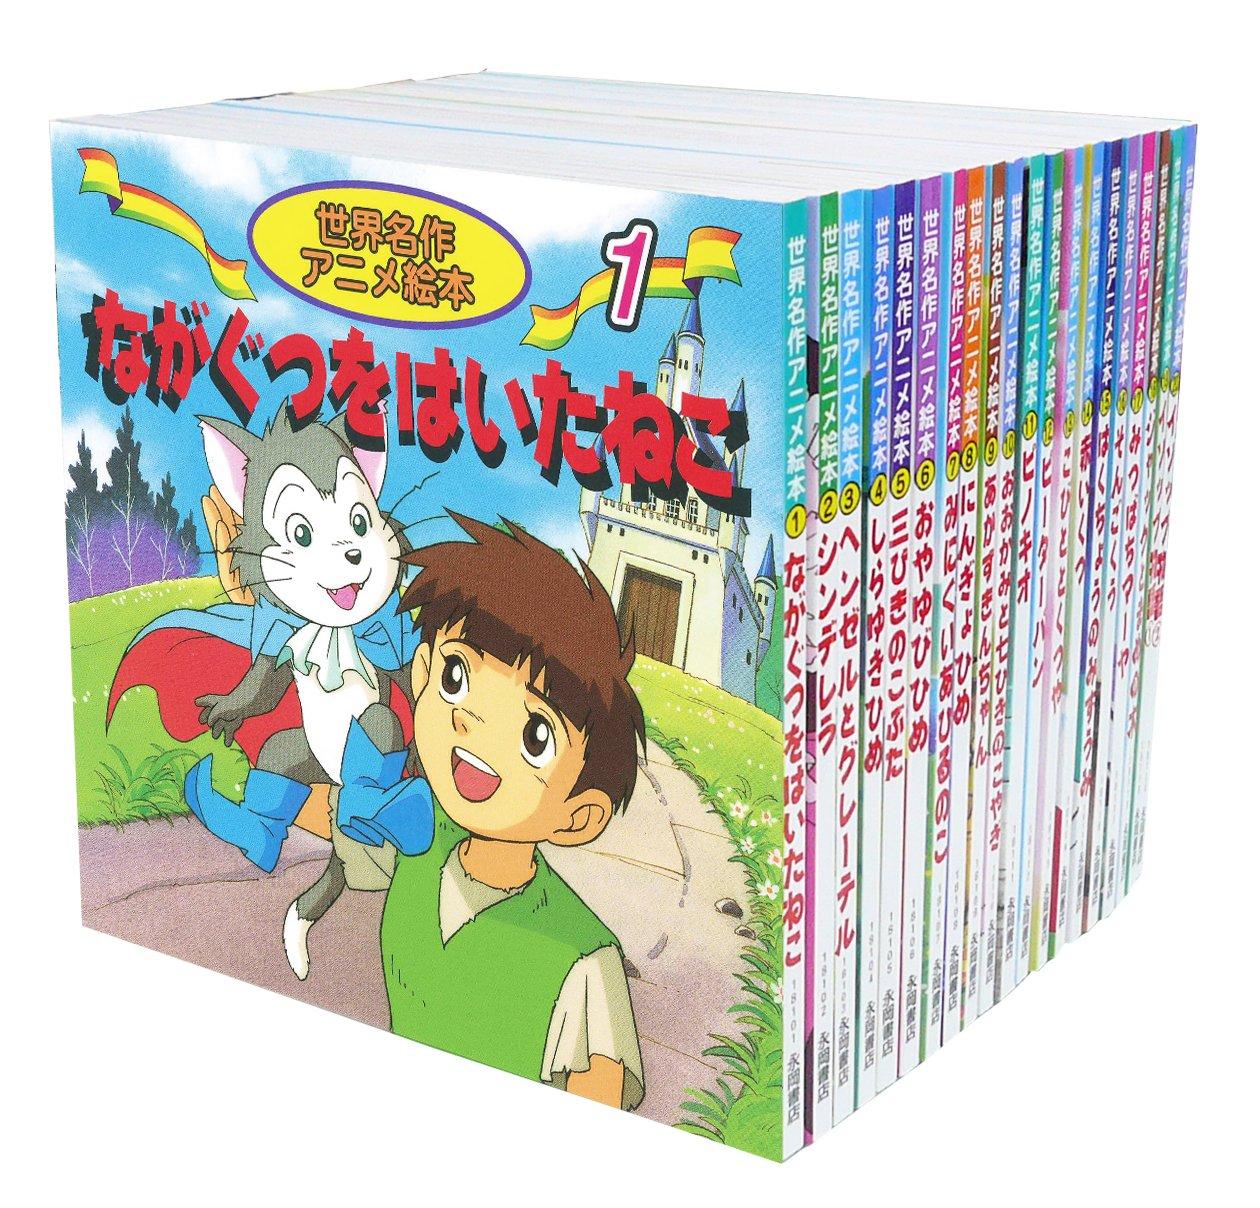 World masterpiece anime picture 20 book set (vol.1-20) pdf epub